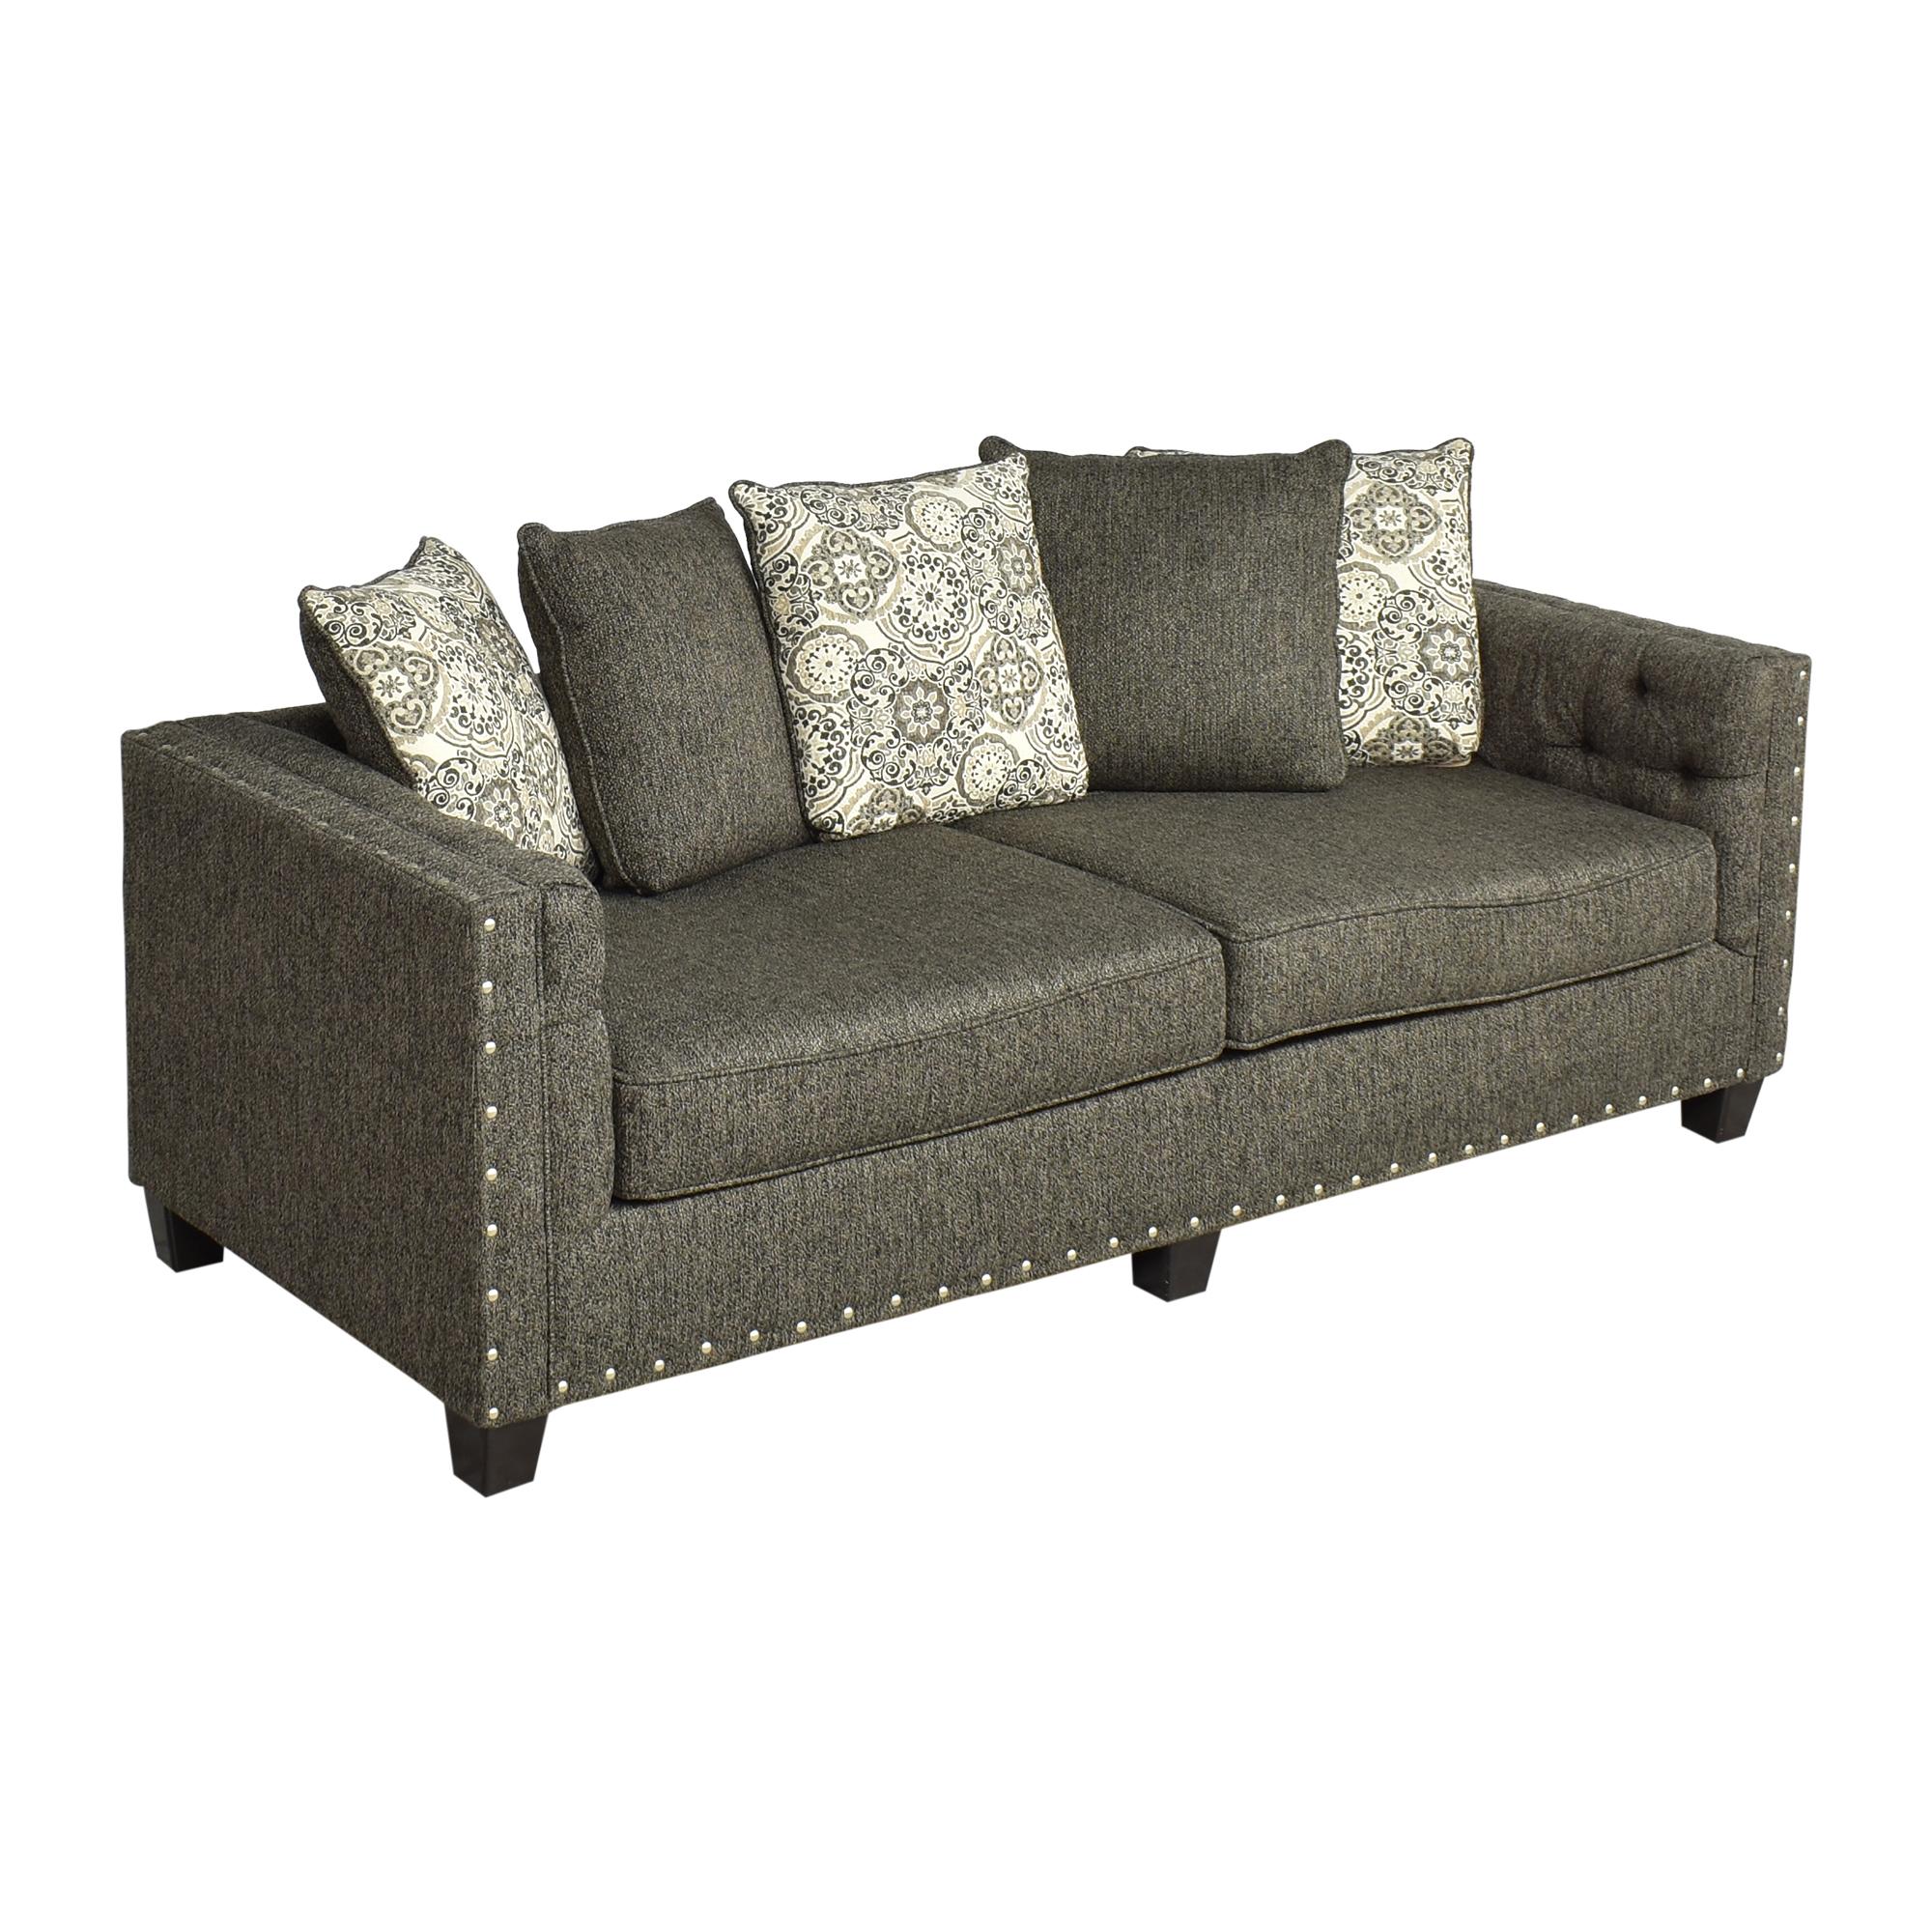 Hughes Furniture Hughes Furniture Nailhead Sofa discount